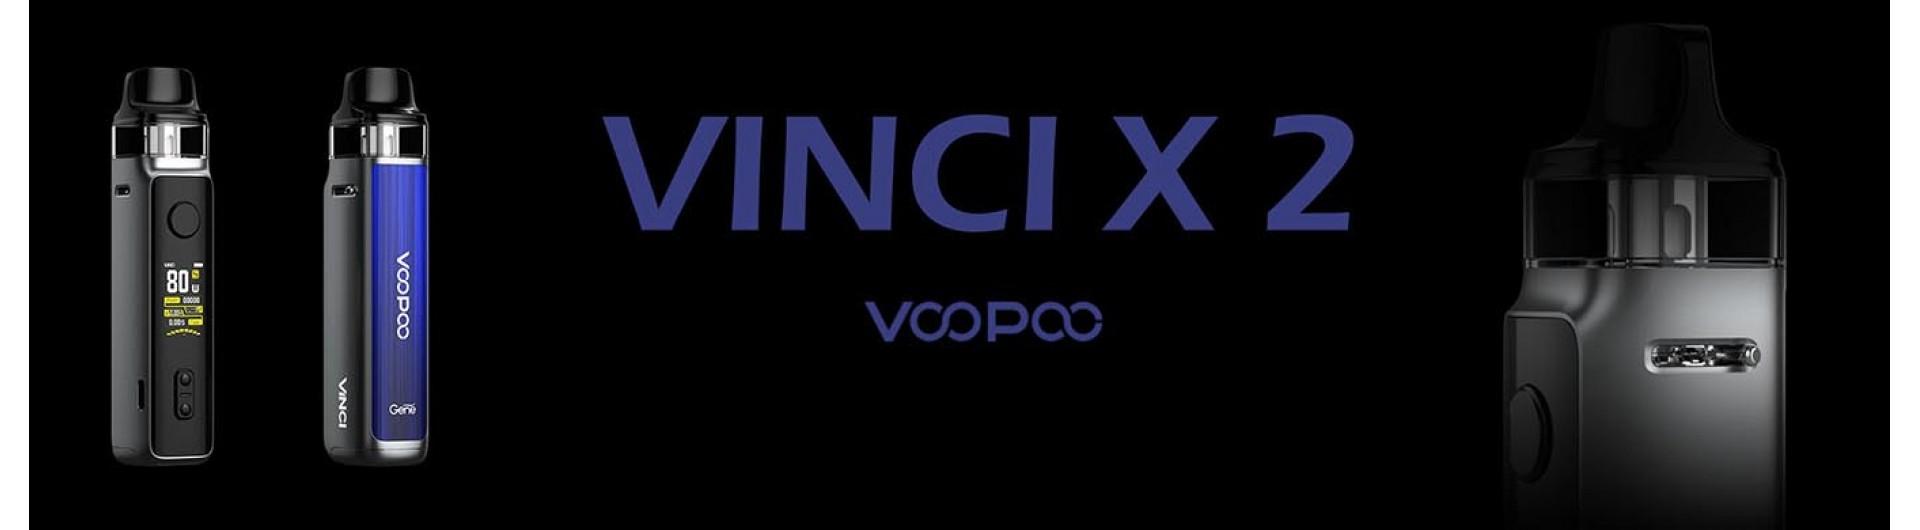 VooPoo Vinci X 2 Pod Mod Kit